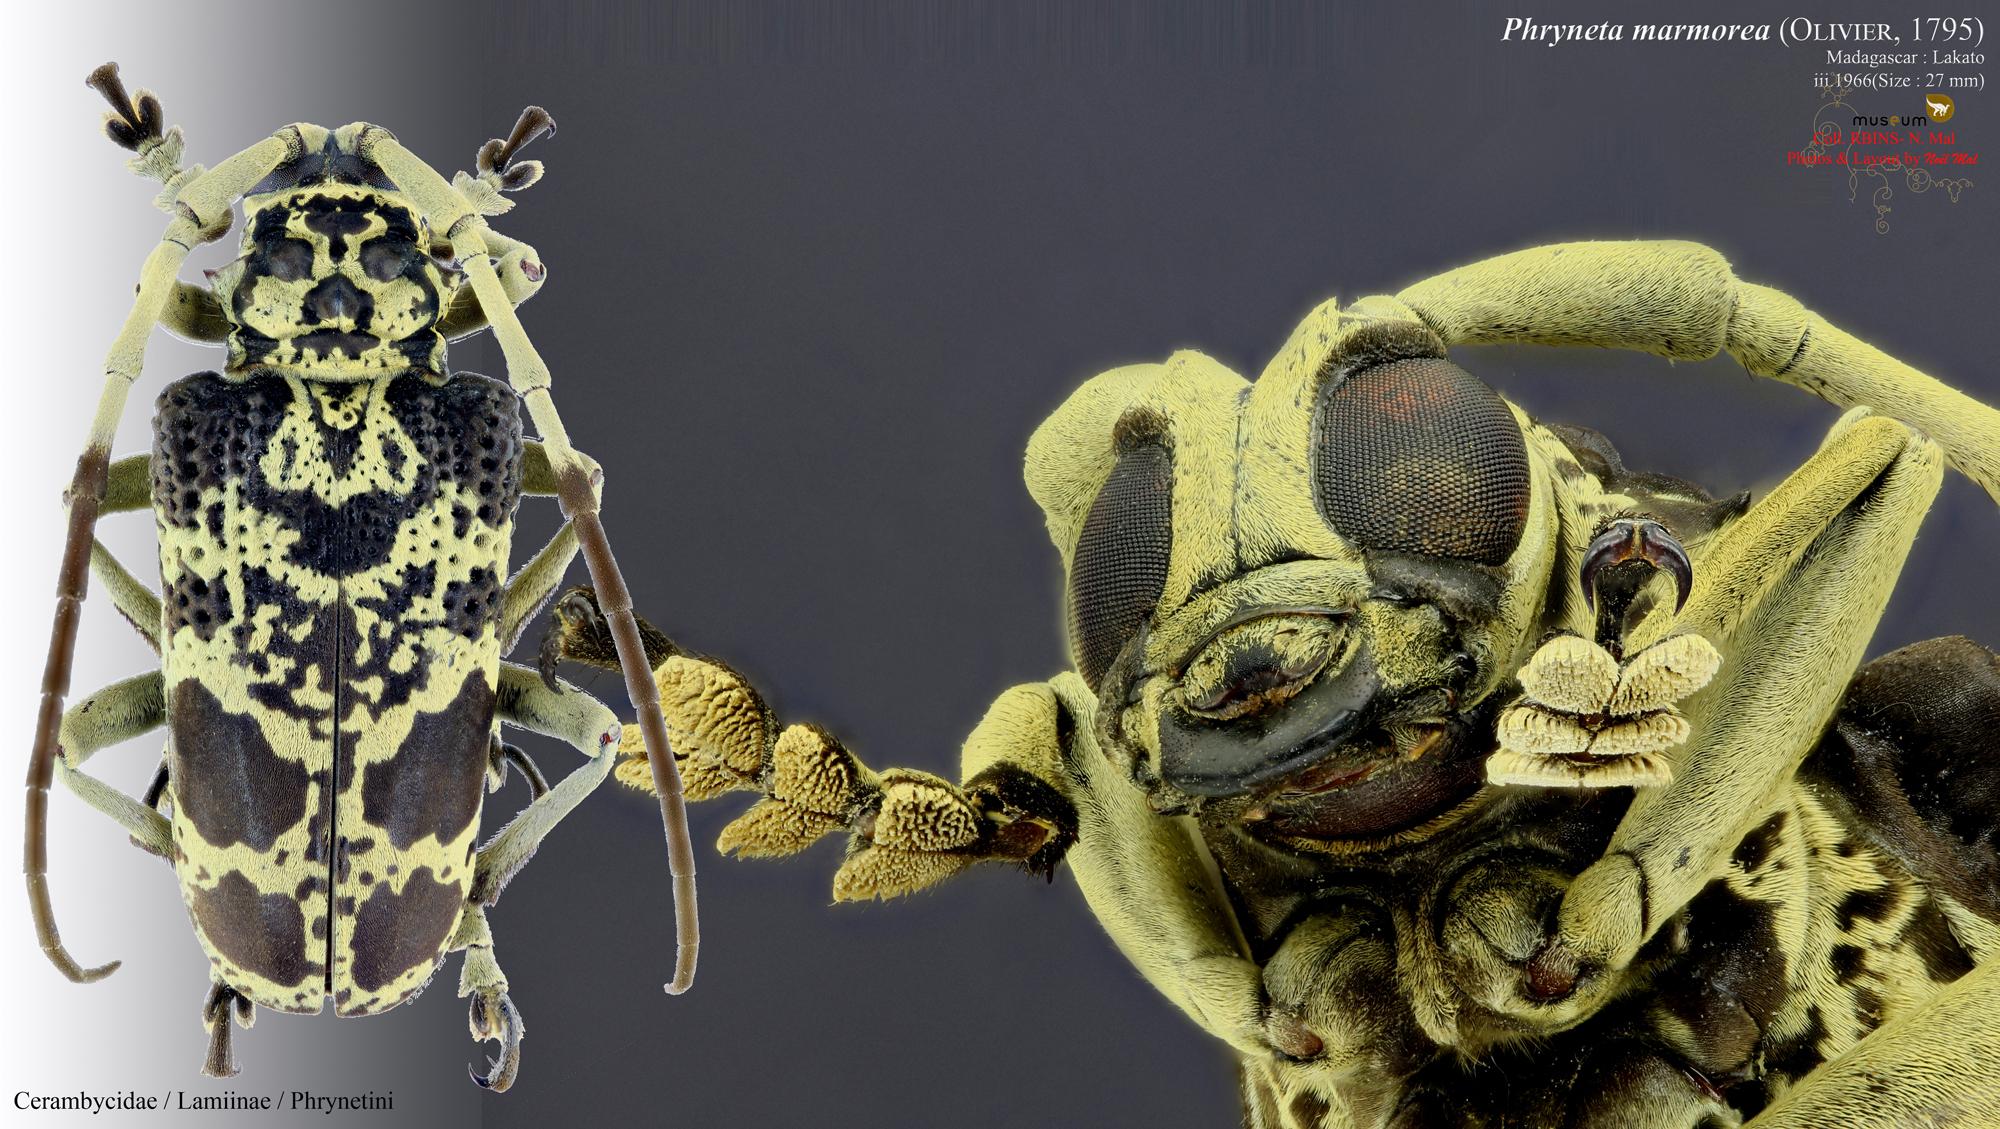 Phryneta marmorea.jpg